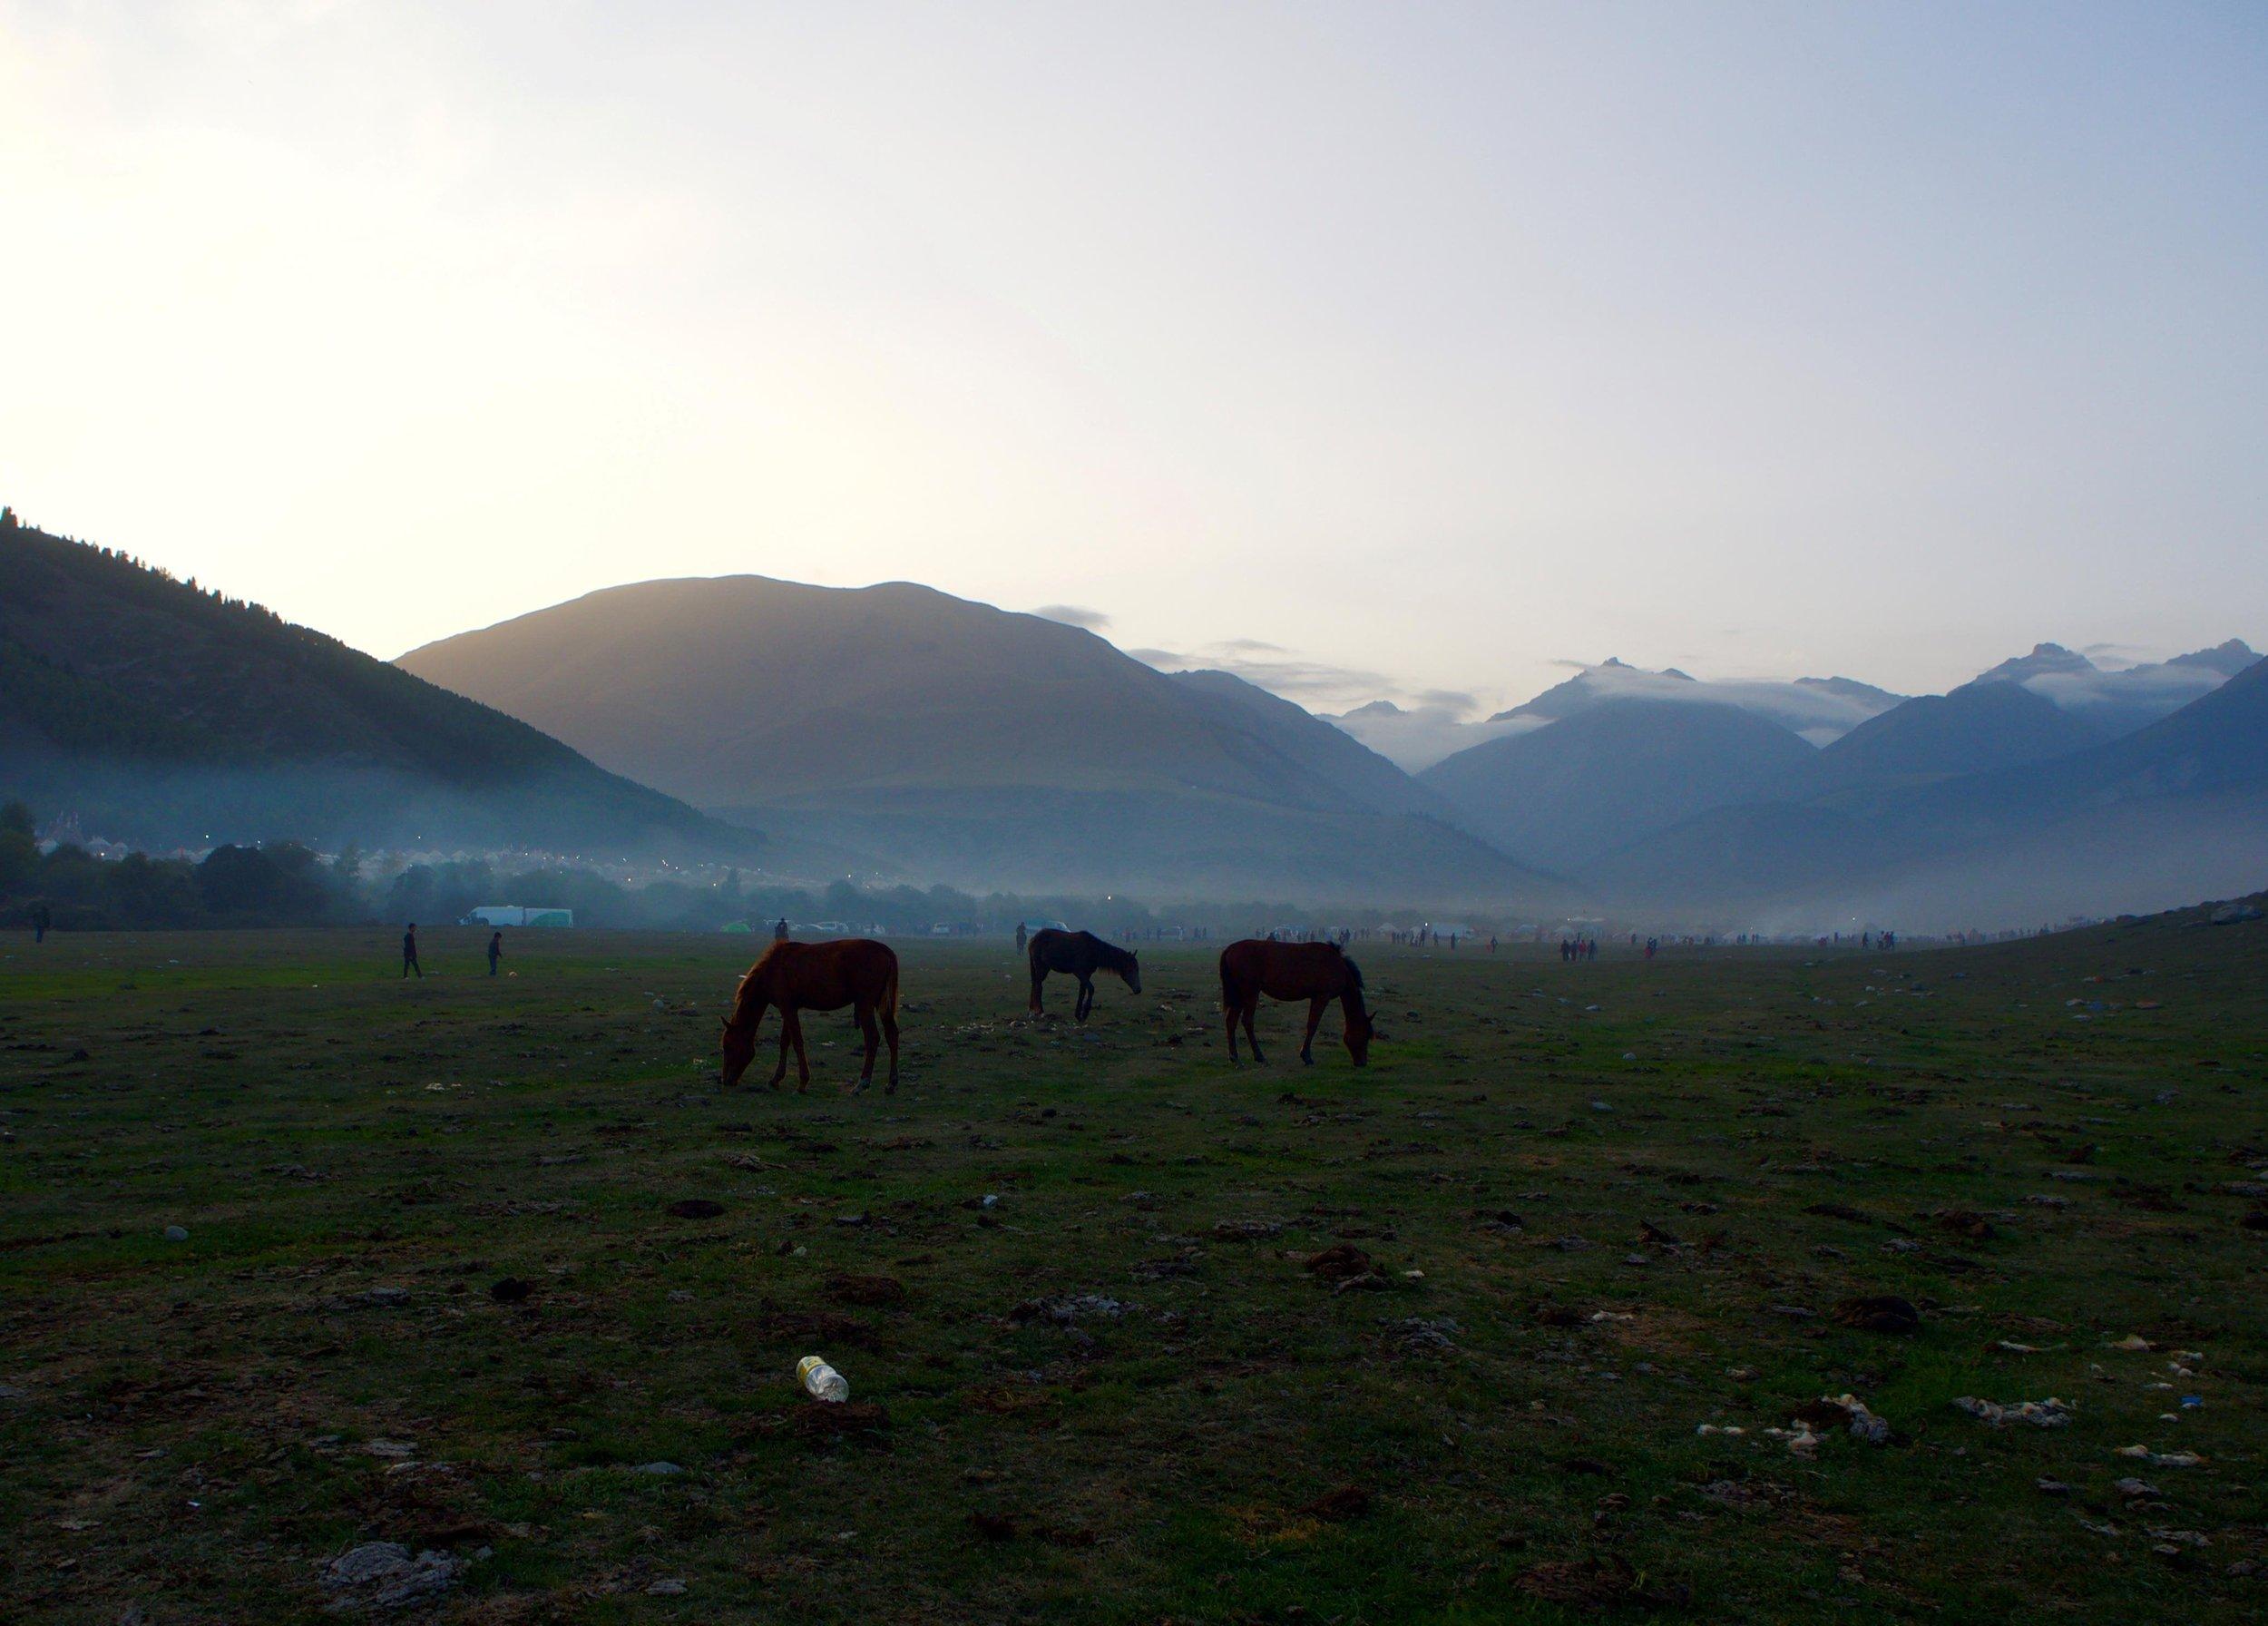 Up in Kyrchyn Gorge  Photo by: Emilie Adriaen-Gourraud